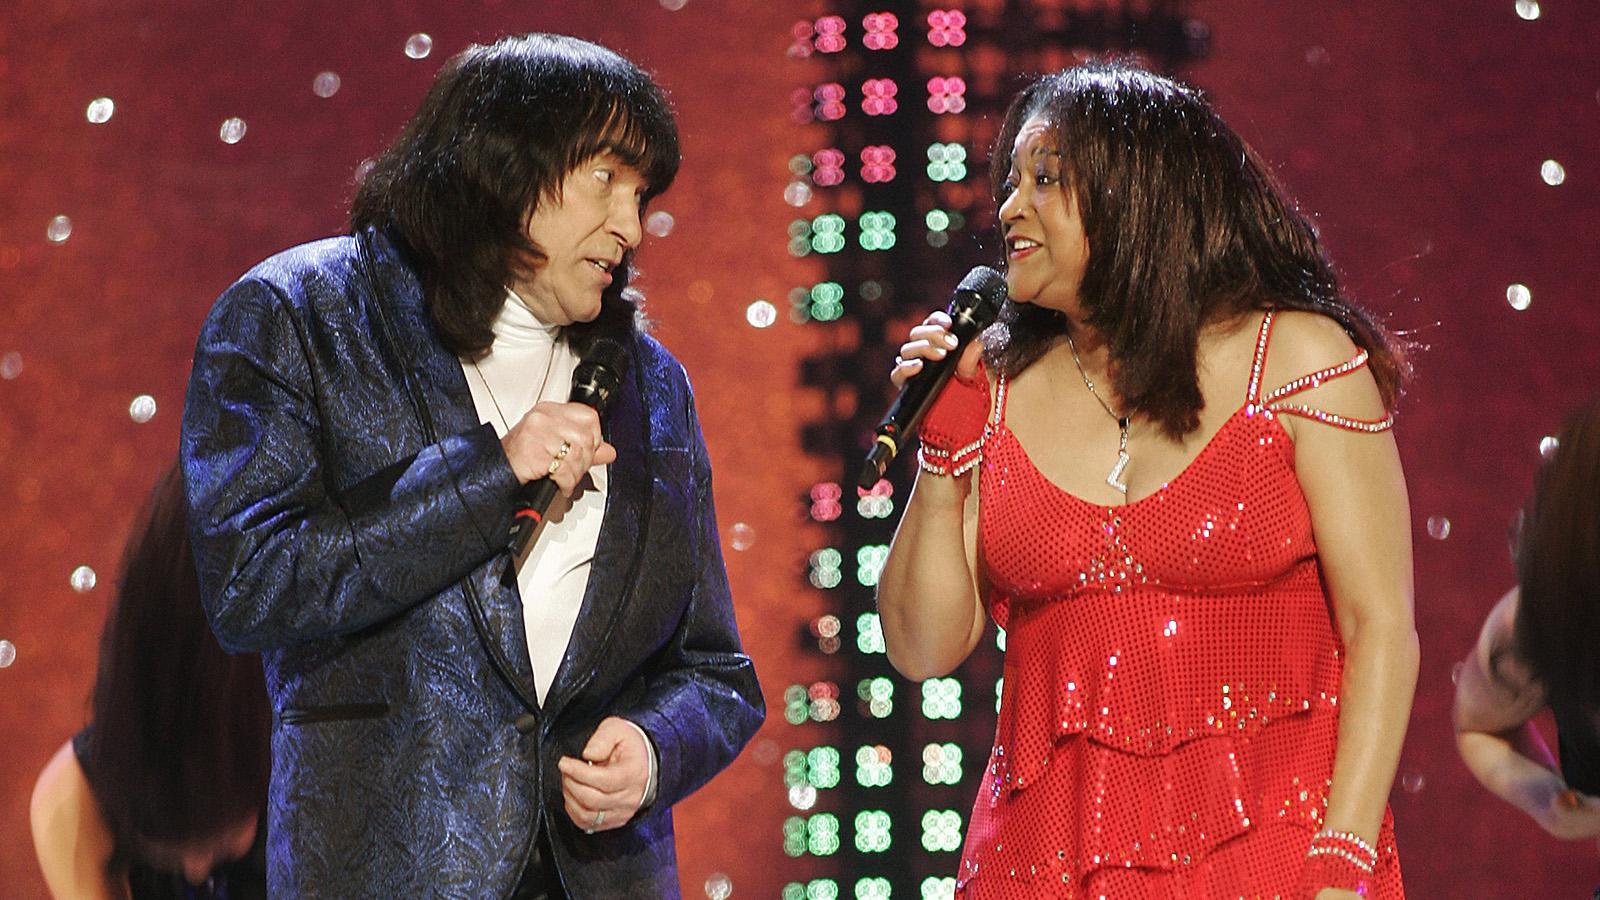 Svenne & Lotta gästspelade i Melodifestivalen 2005.